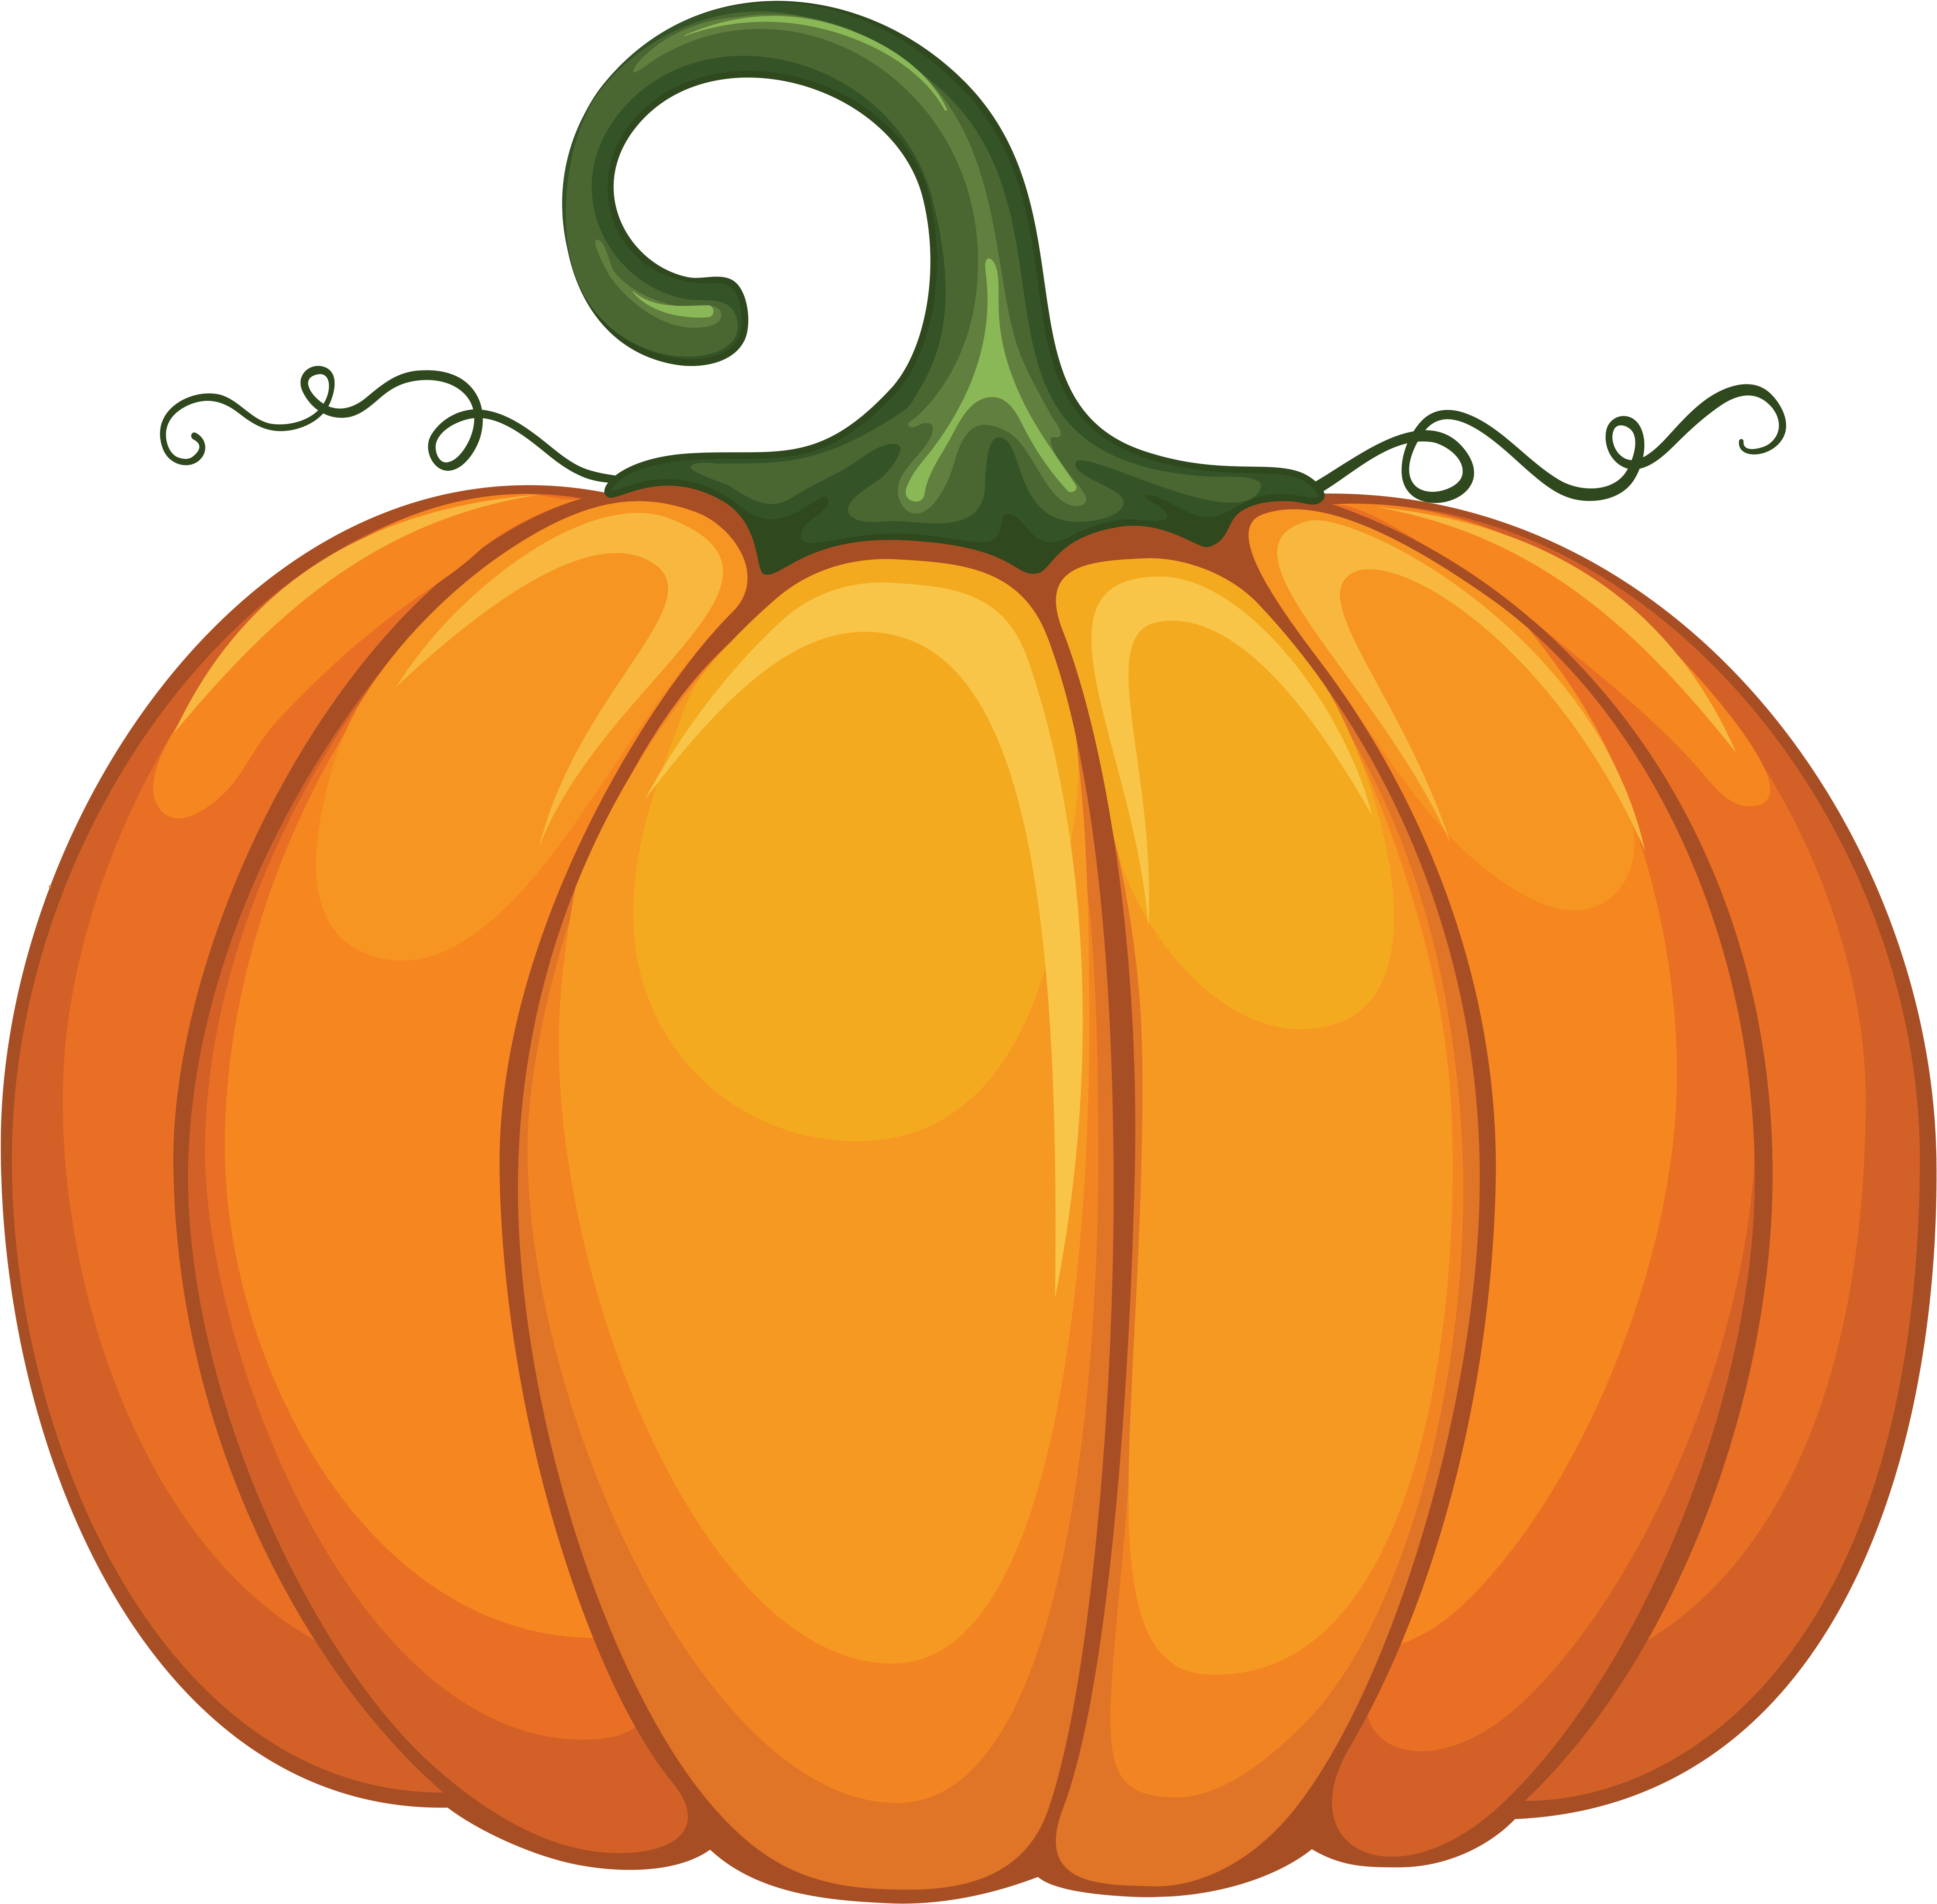 clipart pumpkin transparent background